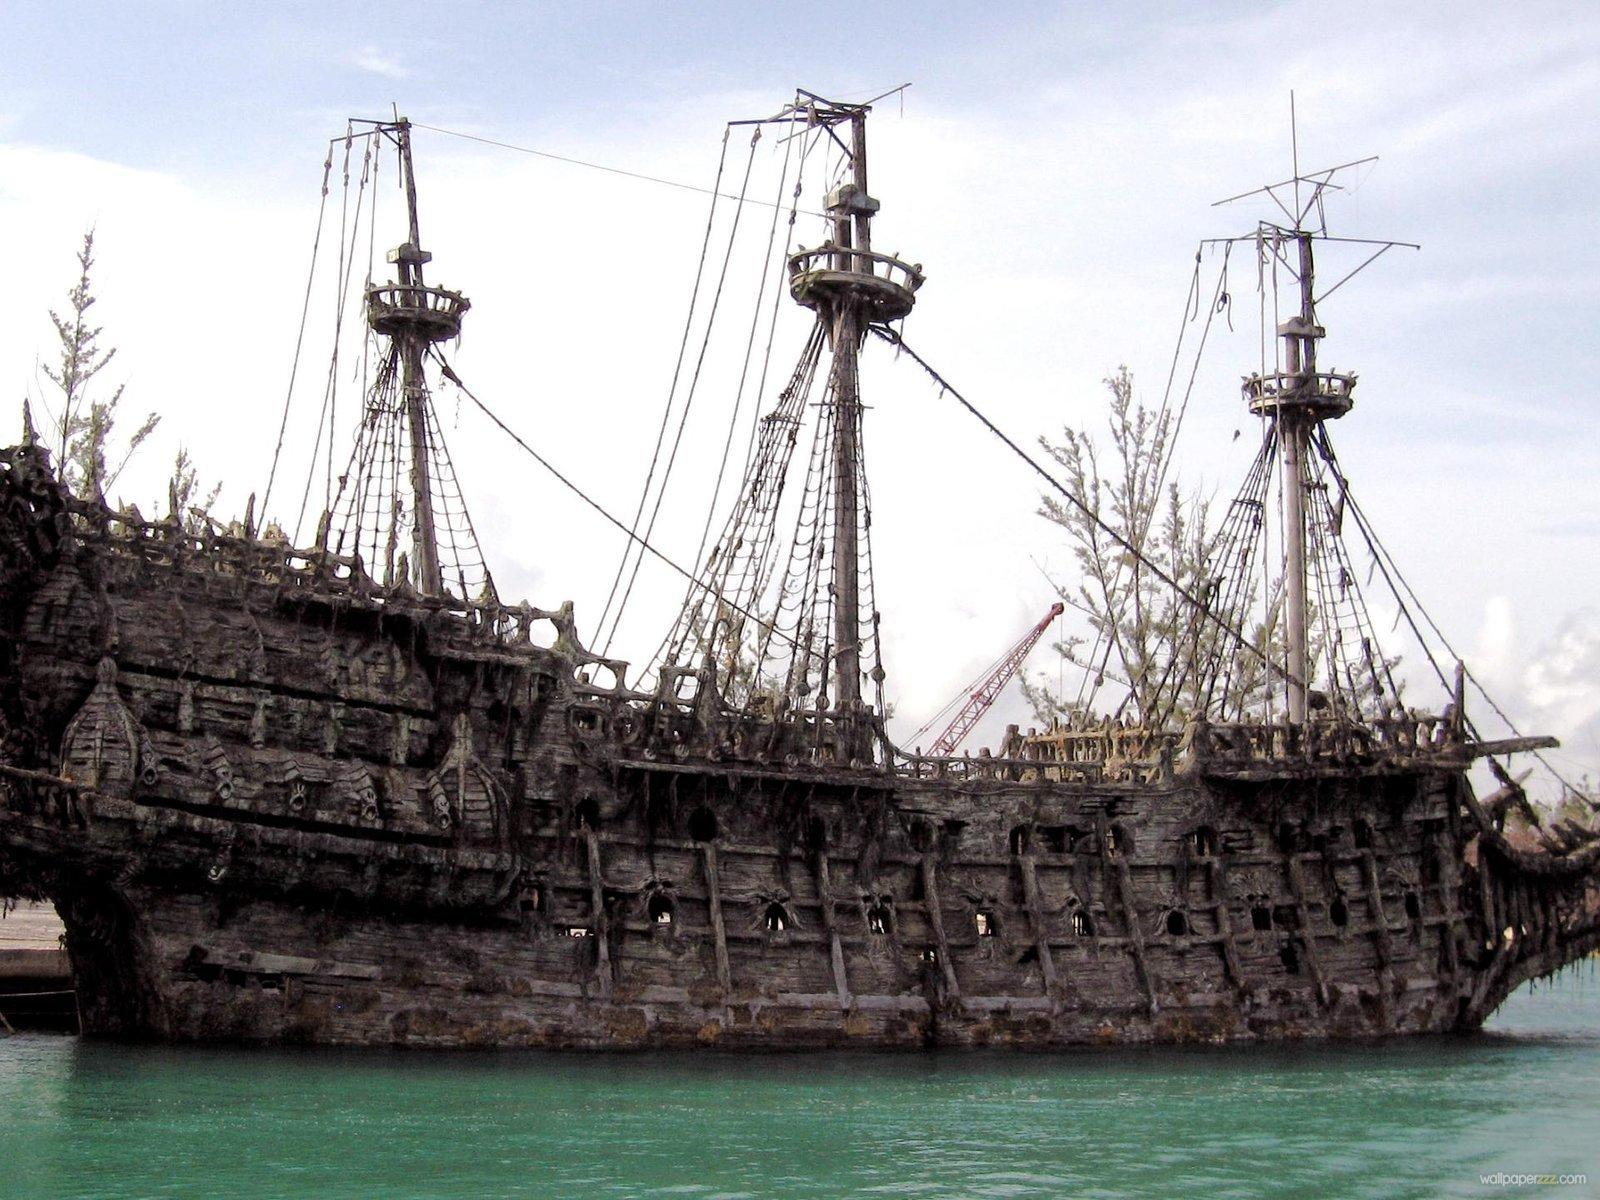 Hd Pirate Ship Wallpaper: Pirate Ship Wallpaper